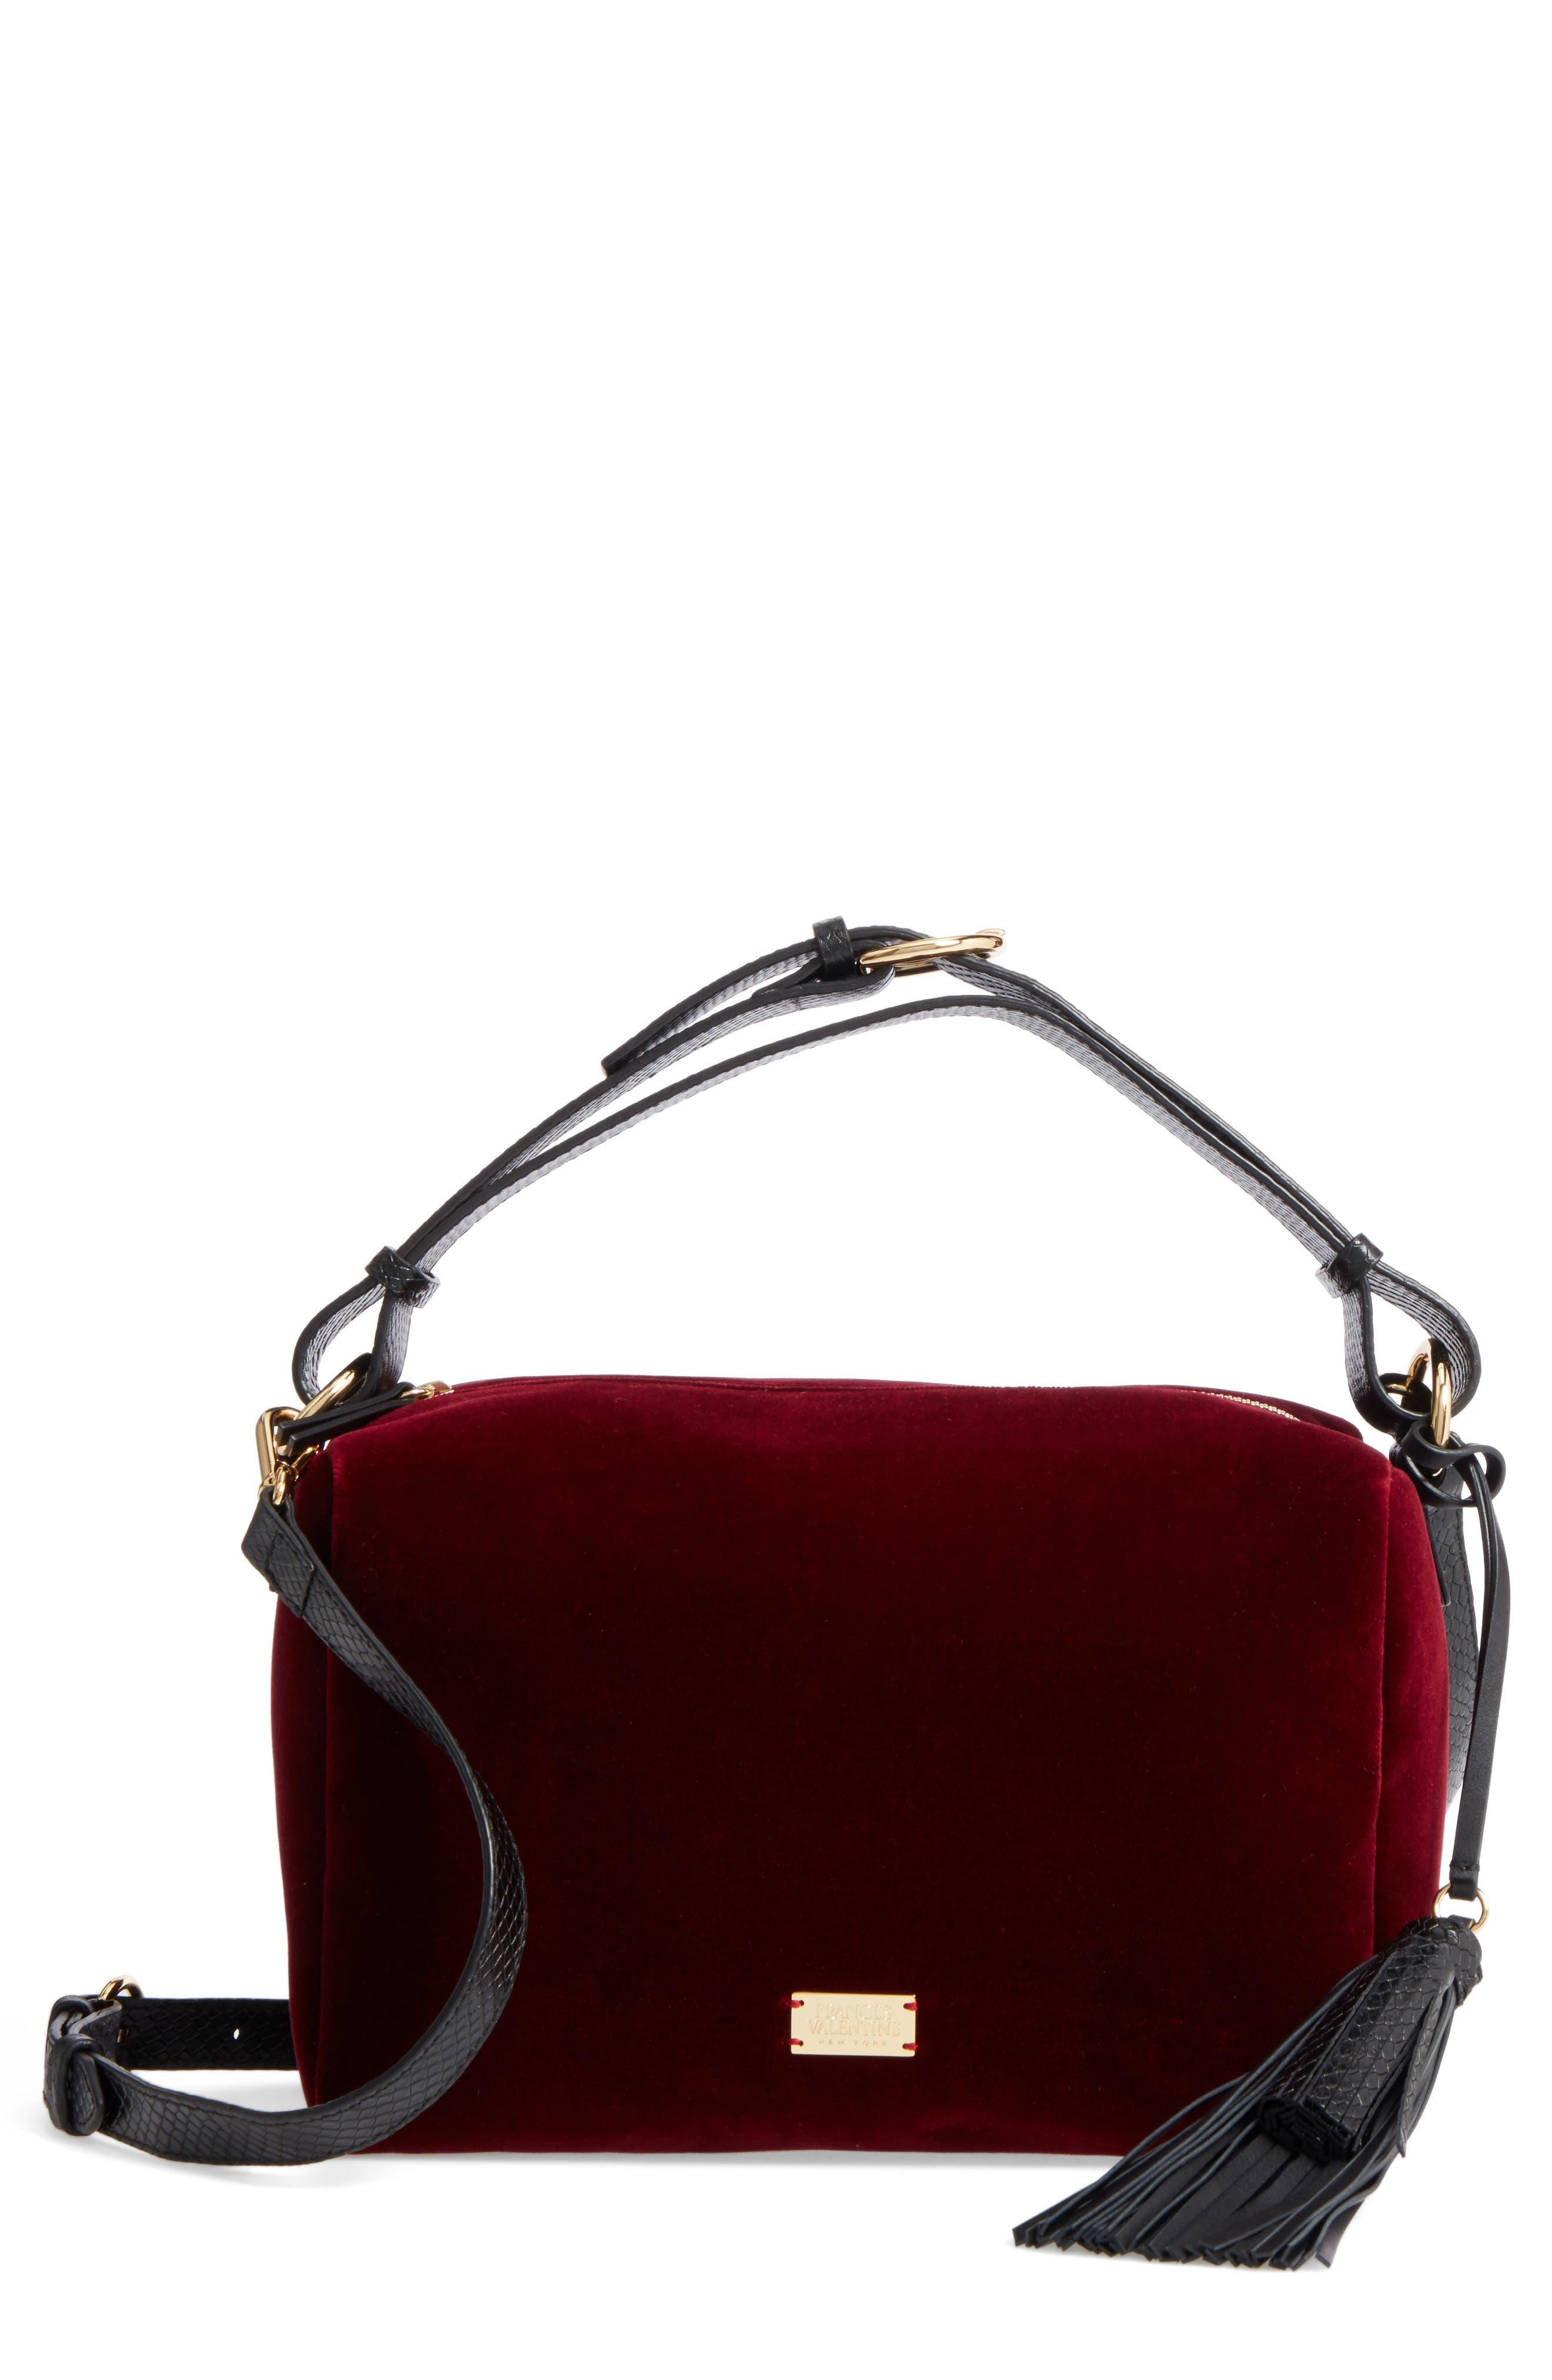 Frances Valentine Small Boxy Velvet & Leather Satchel